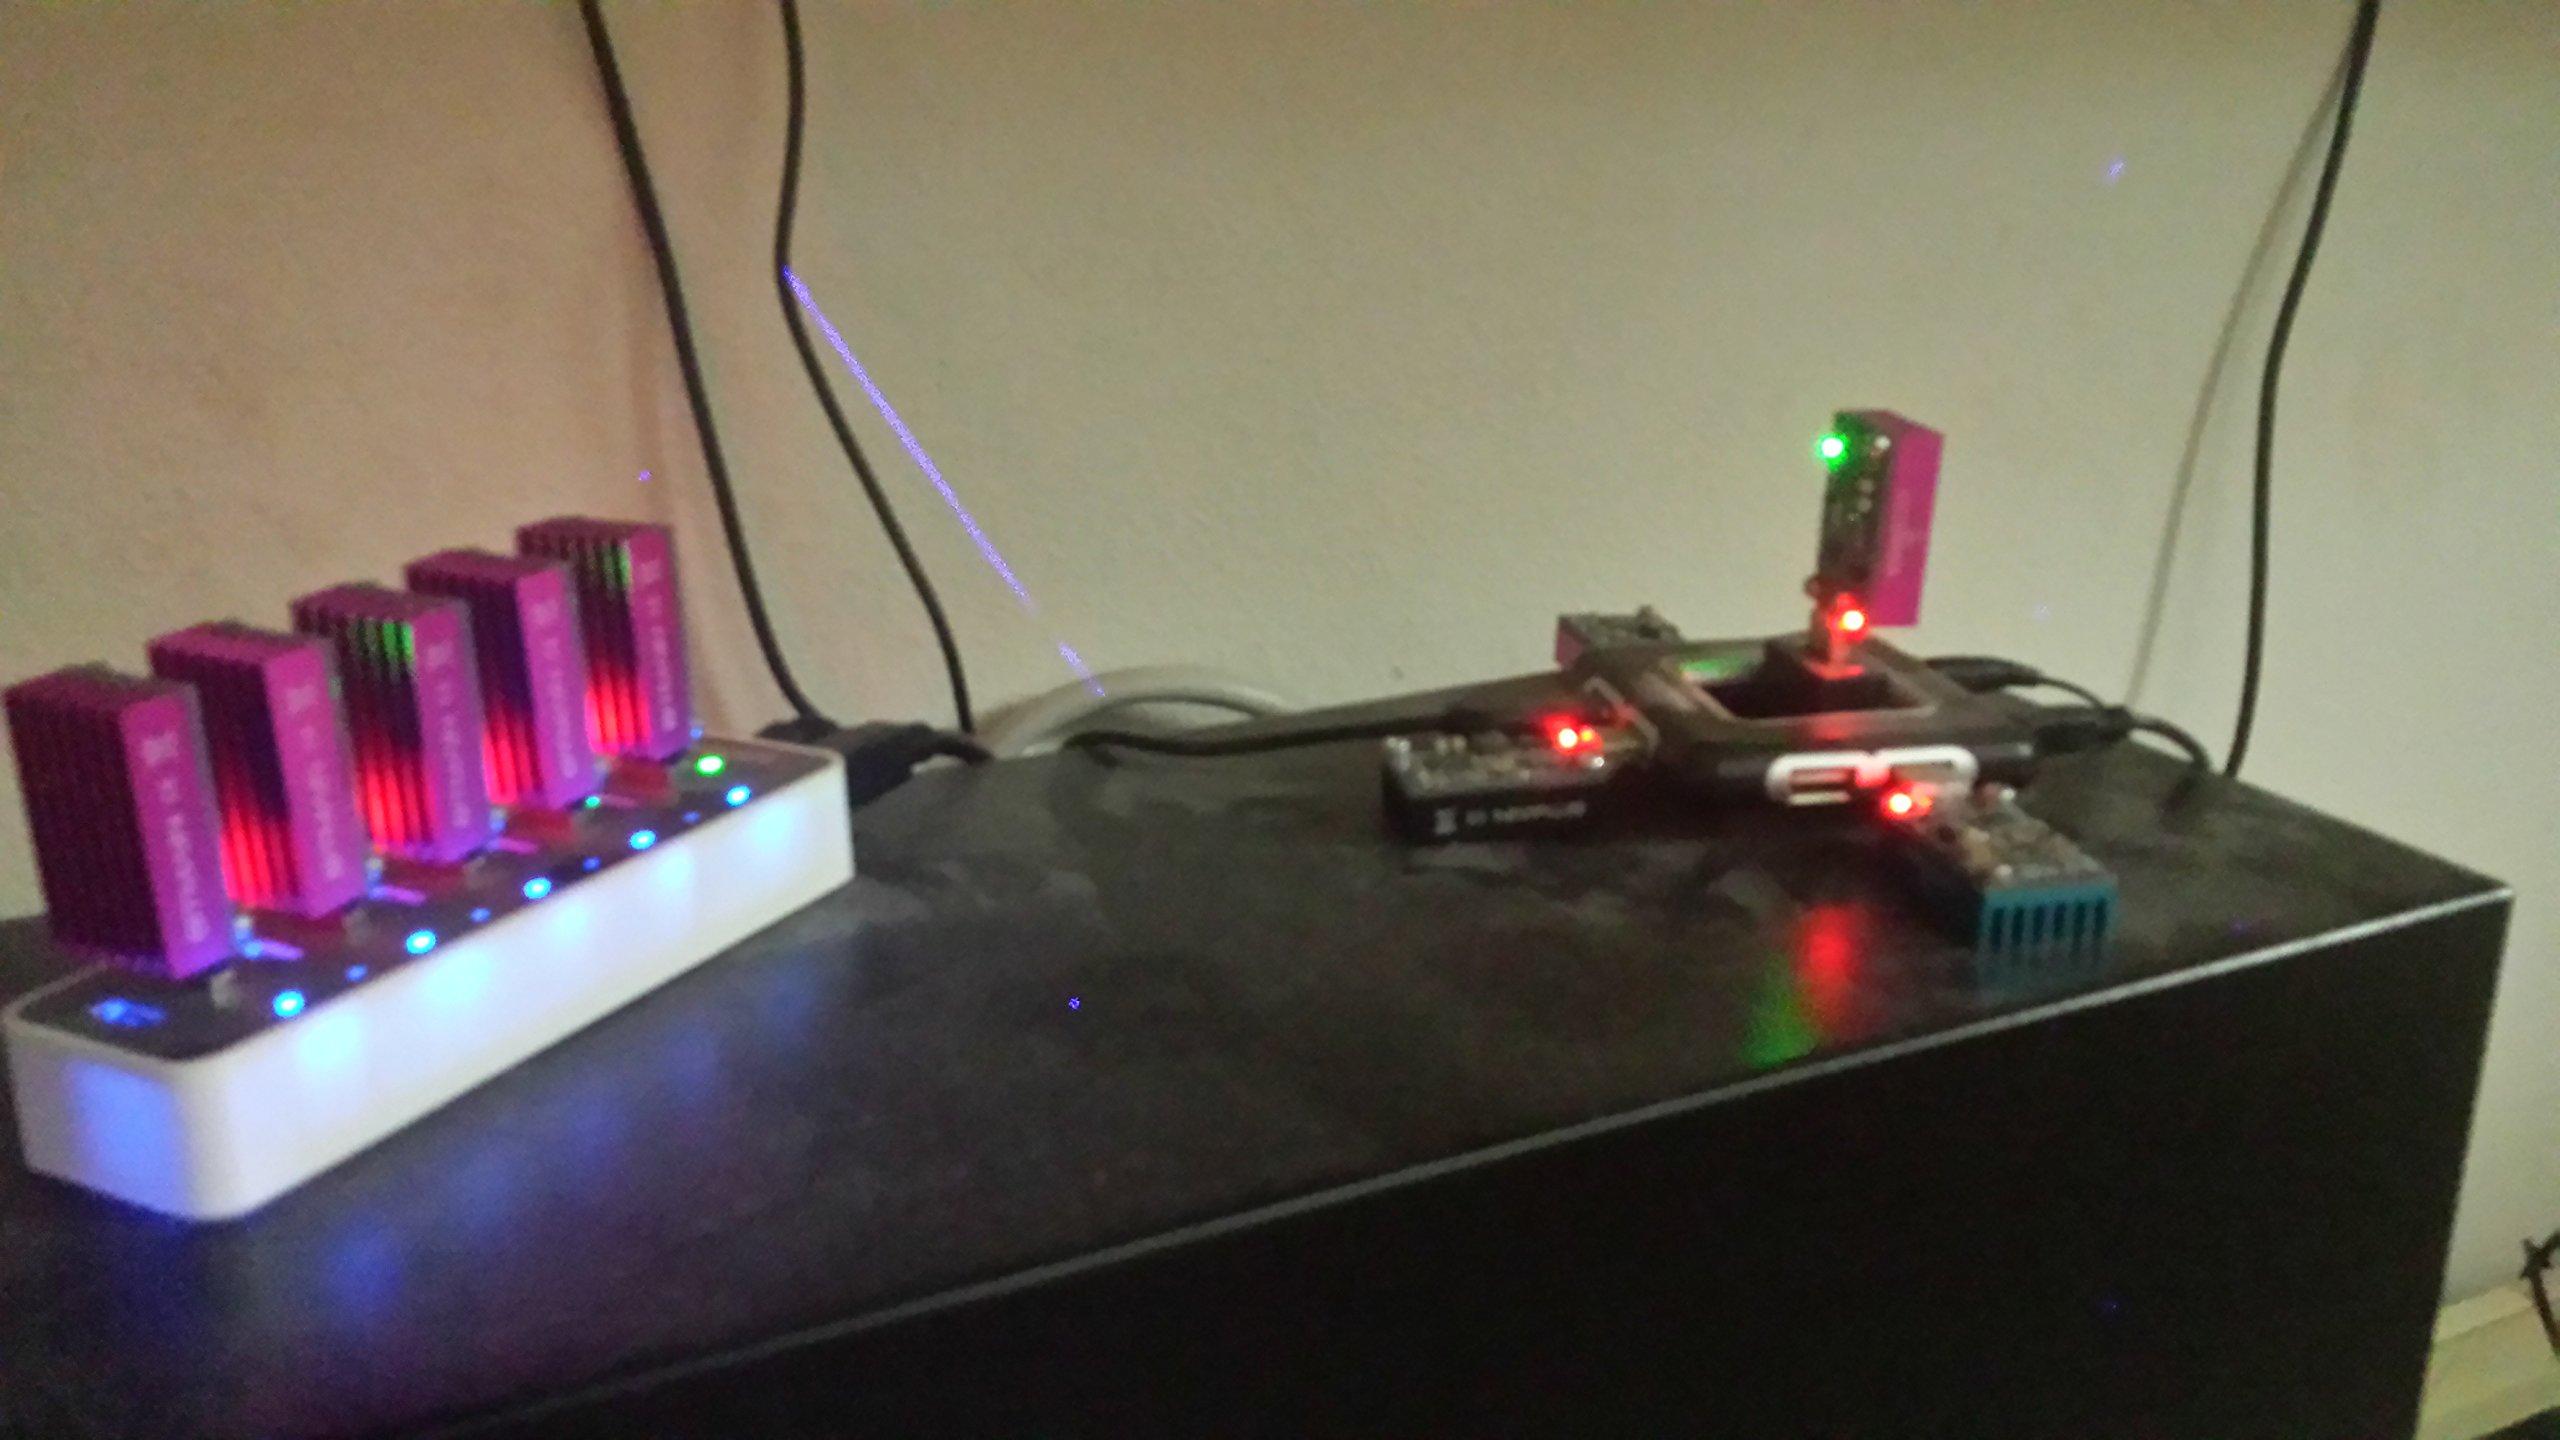 Galleon - BITMAIN ANTMINER U2 2Gh/s USB Bitcoin ASIC Miner